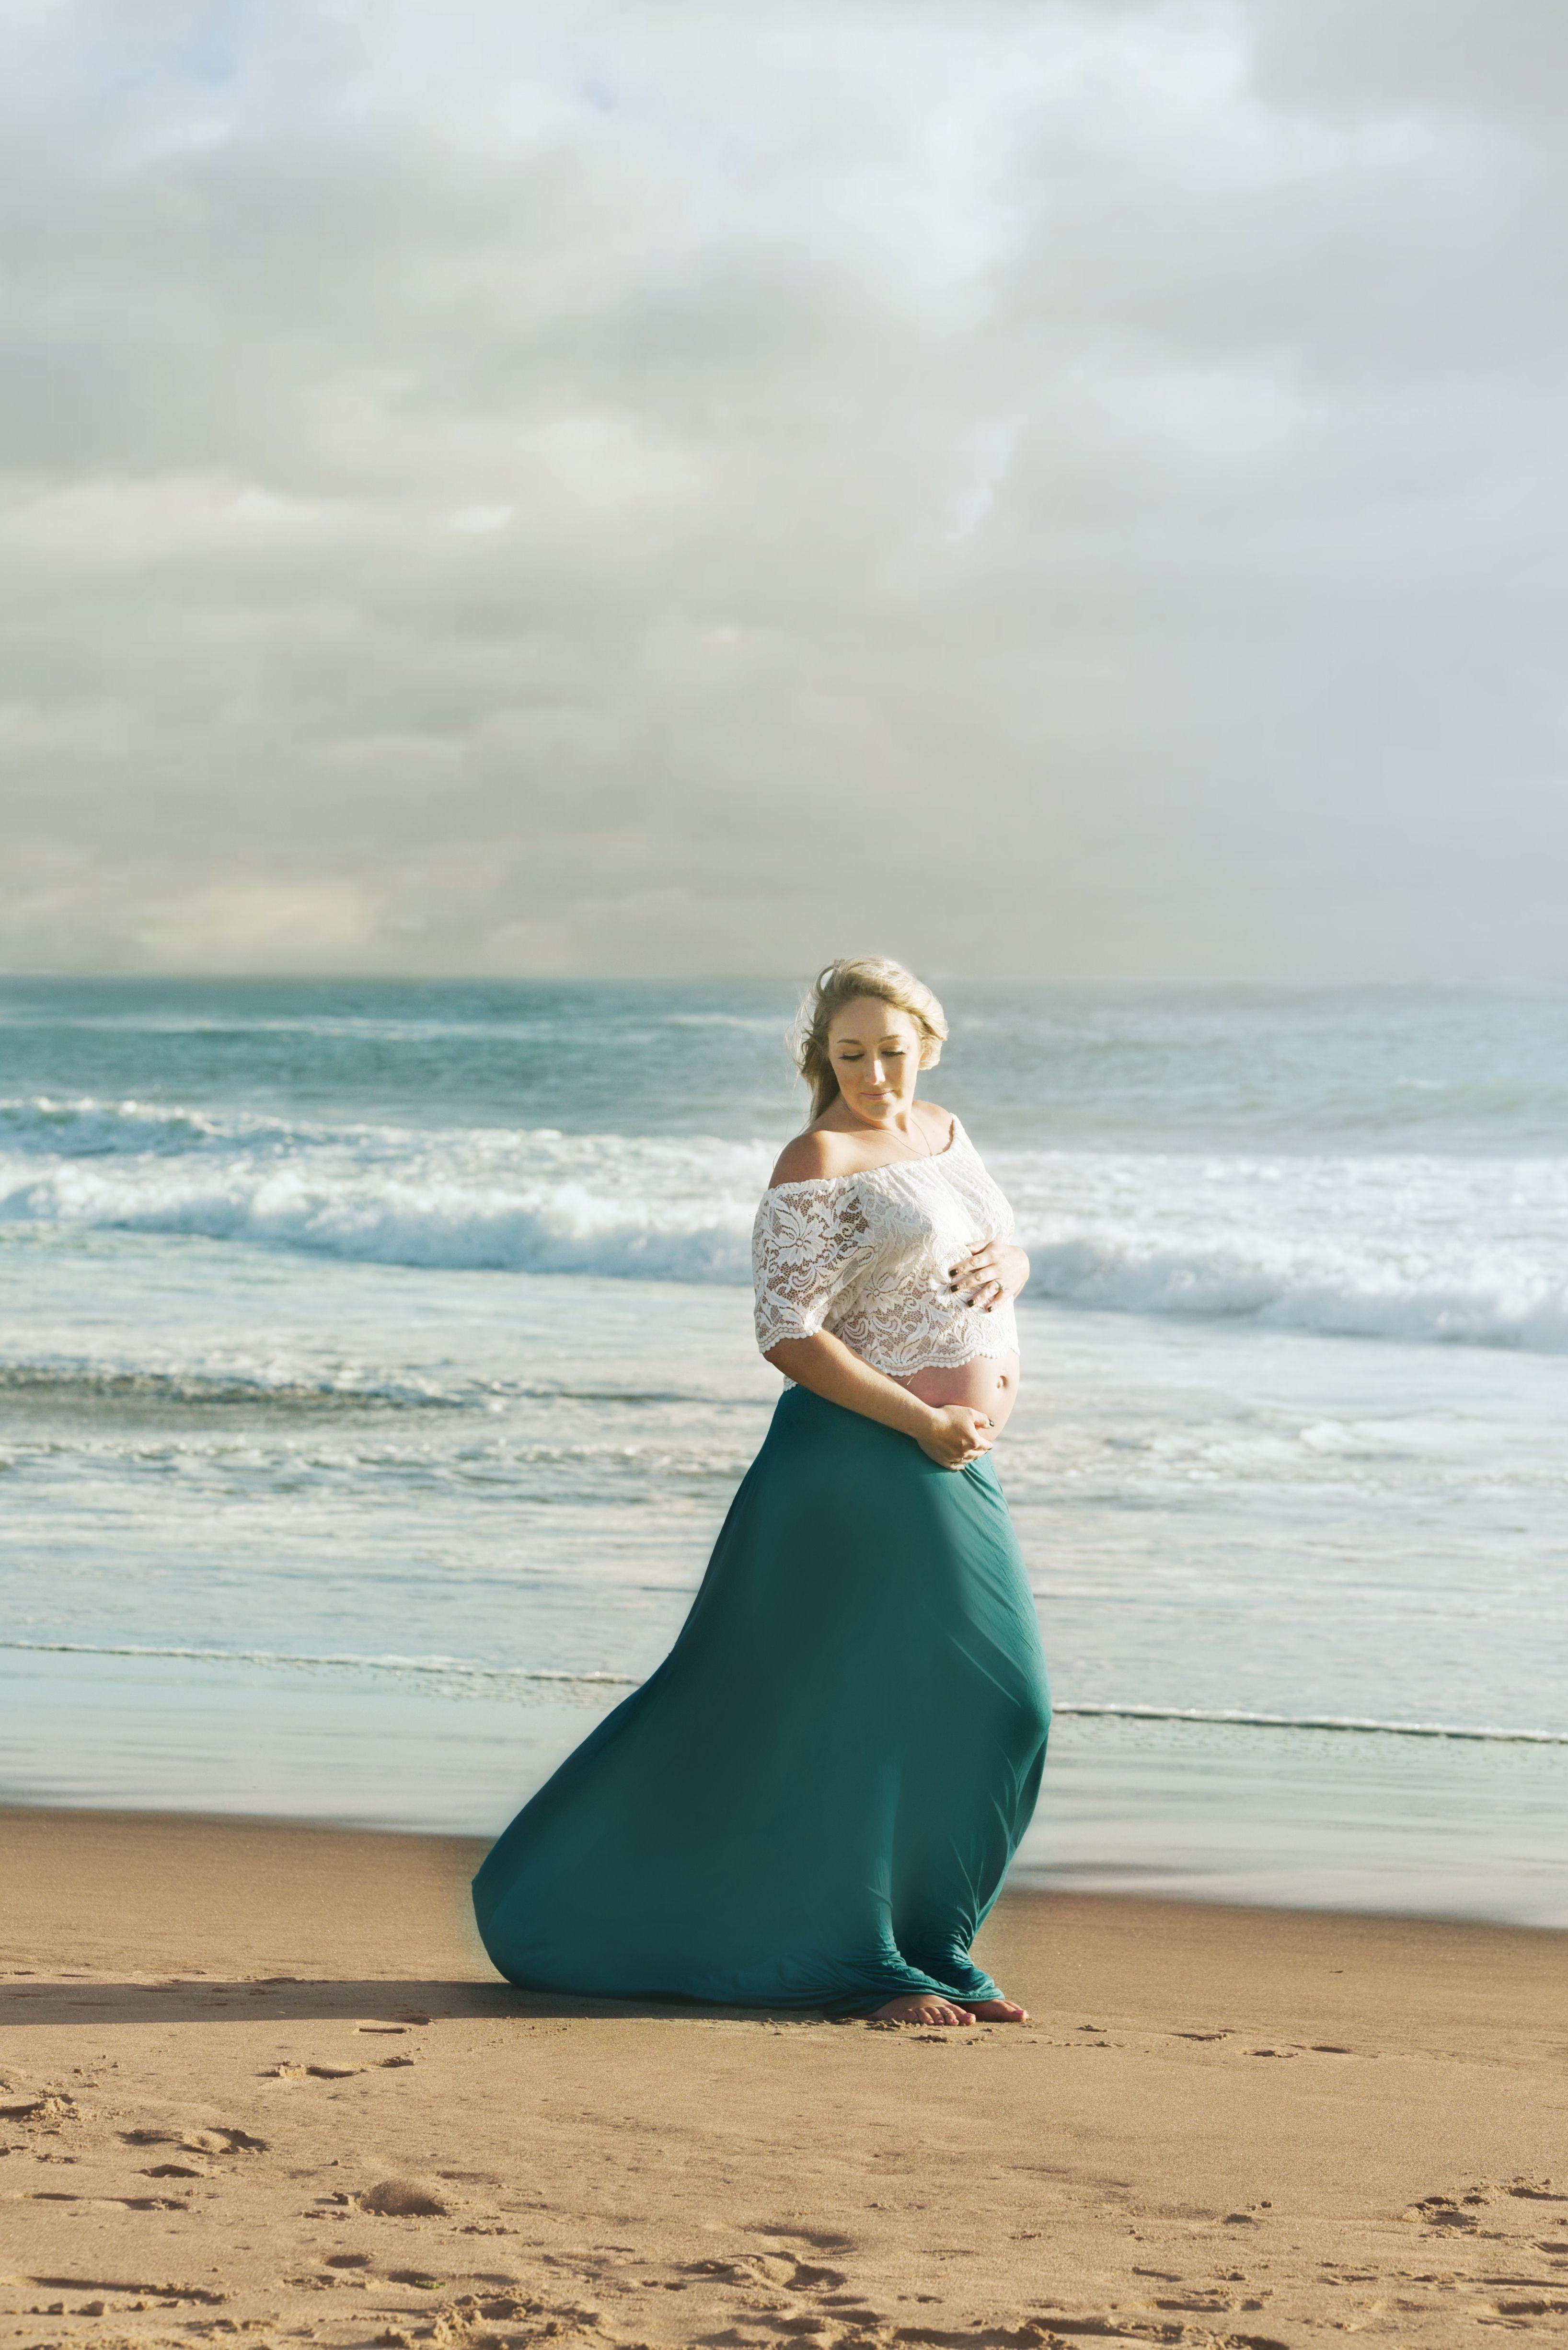 #Beautiful #Maternity #MaternityPhotographer #love #MaternityPhotos #BabyBump #Beachgirl #BeautifulMama #PortlandMaternityPhotographer #baby #MaternityPhotography #PDX #Oregon #ExploreOregon #OregonBeautiful